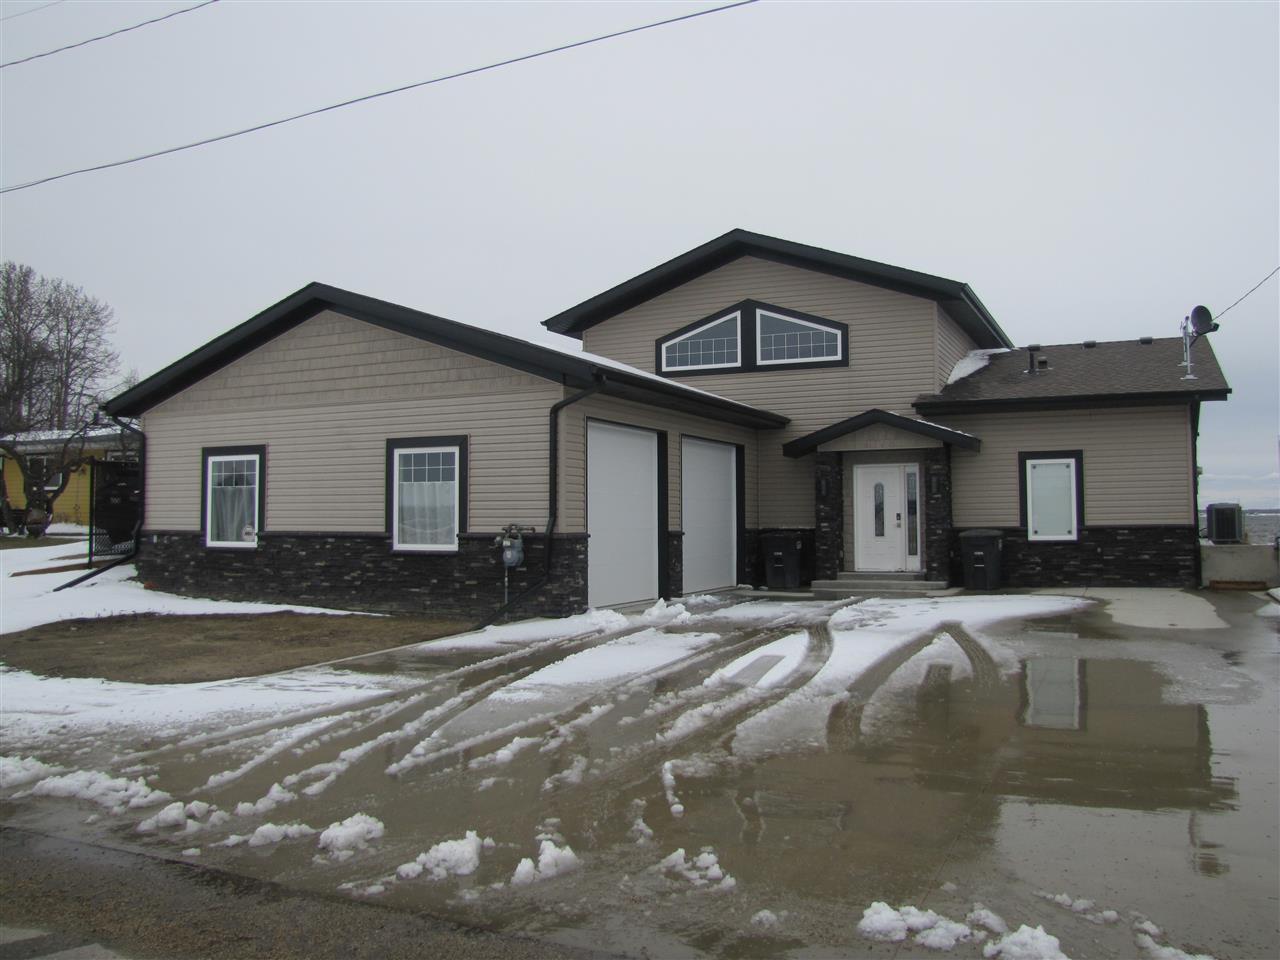 Main Photo: 6808 50 Avenue: Rural Lac Ste. Anne County House for sale : MLS®# E4142655